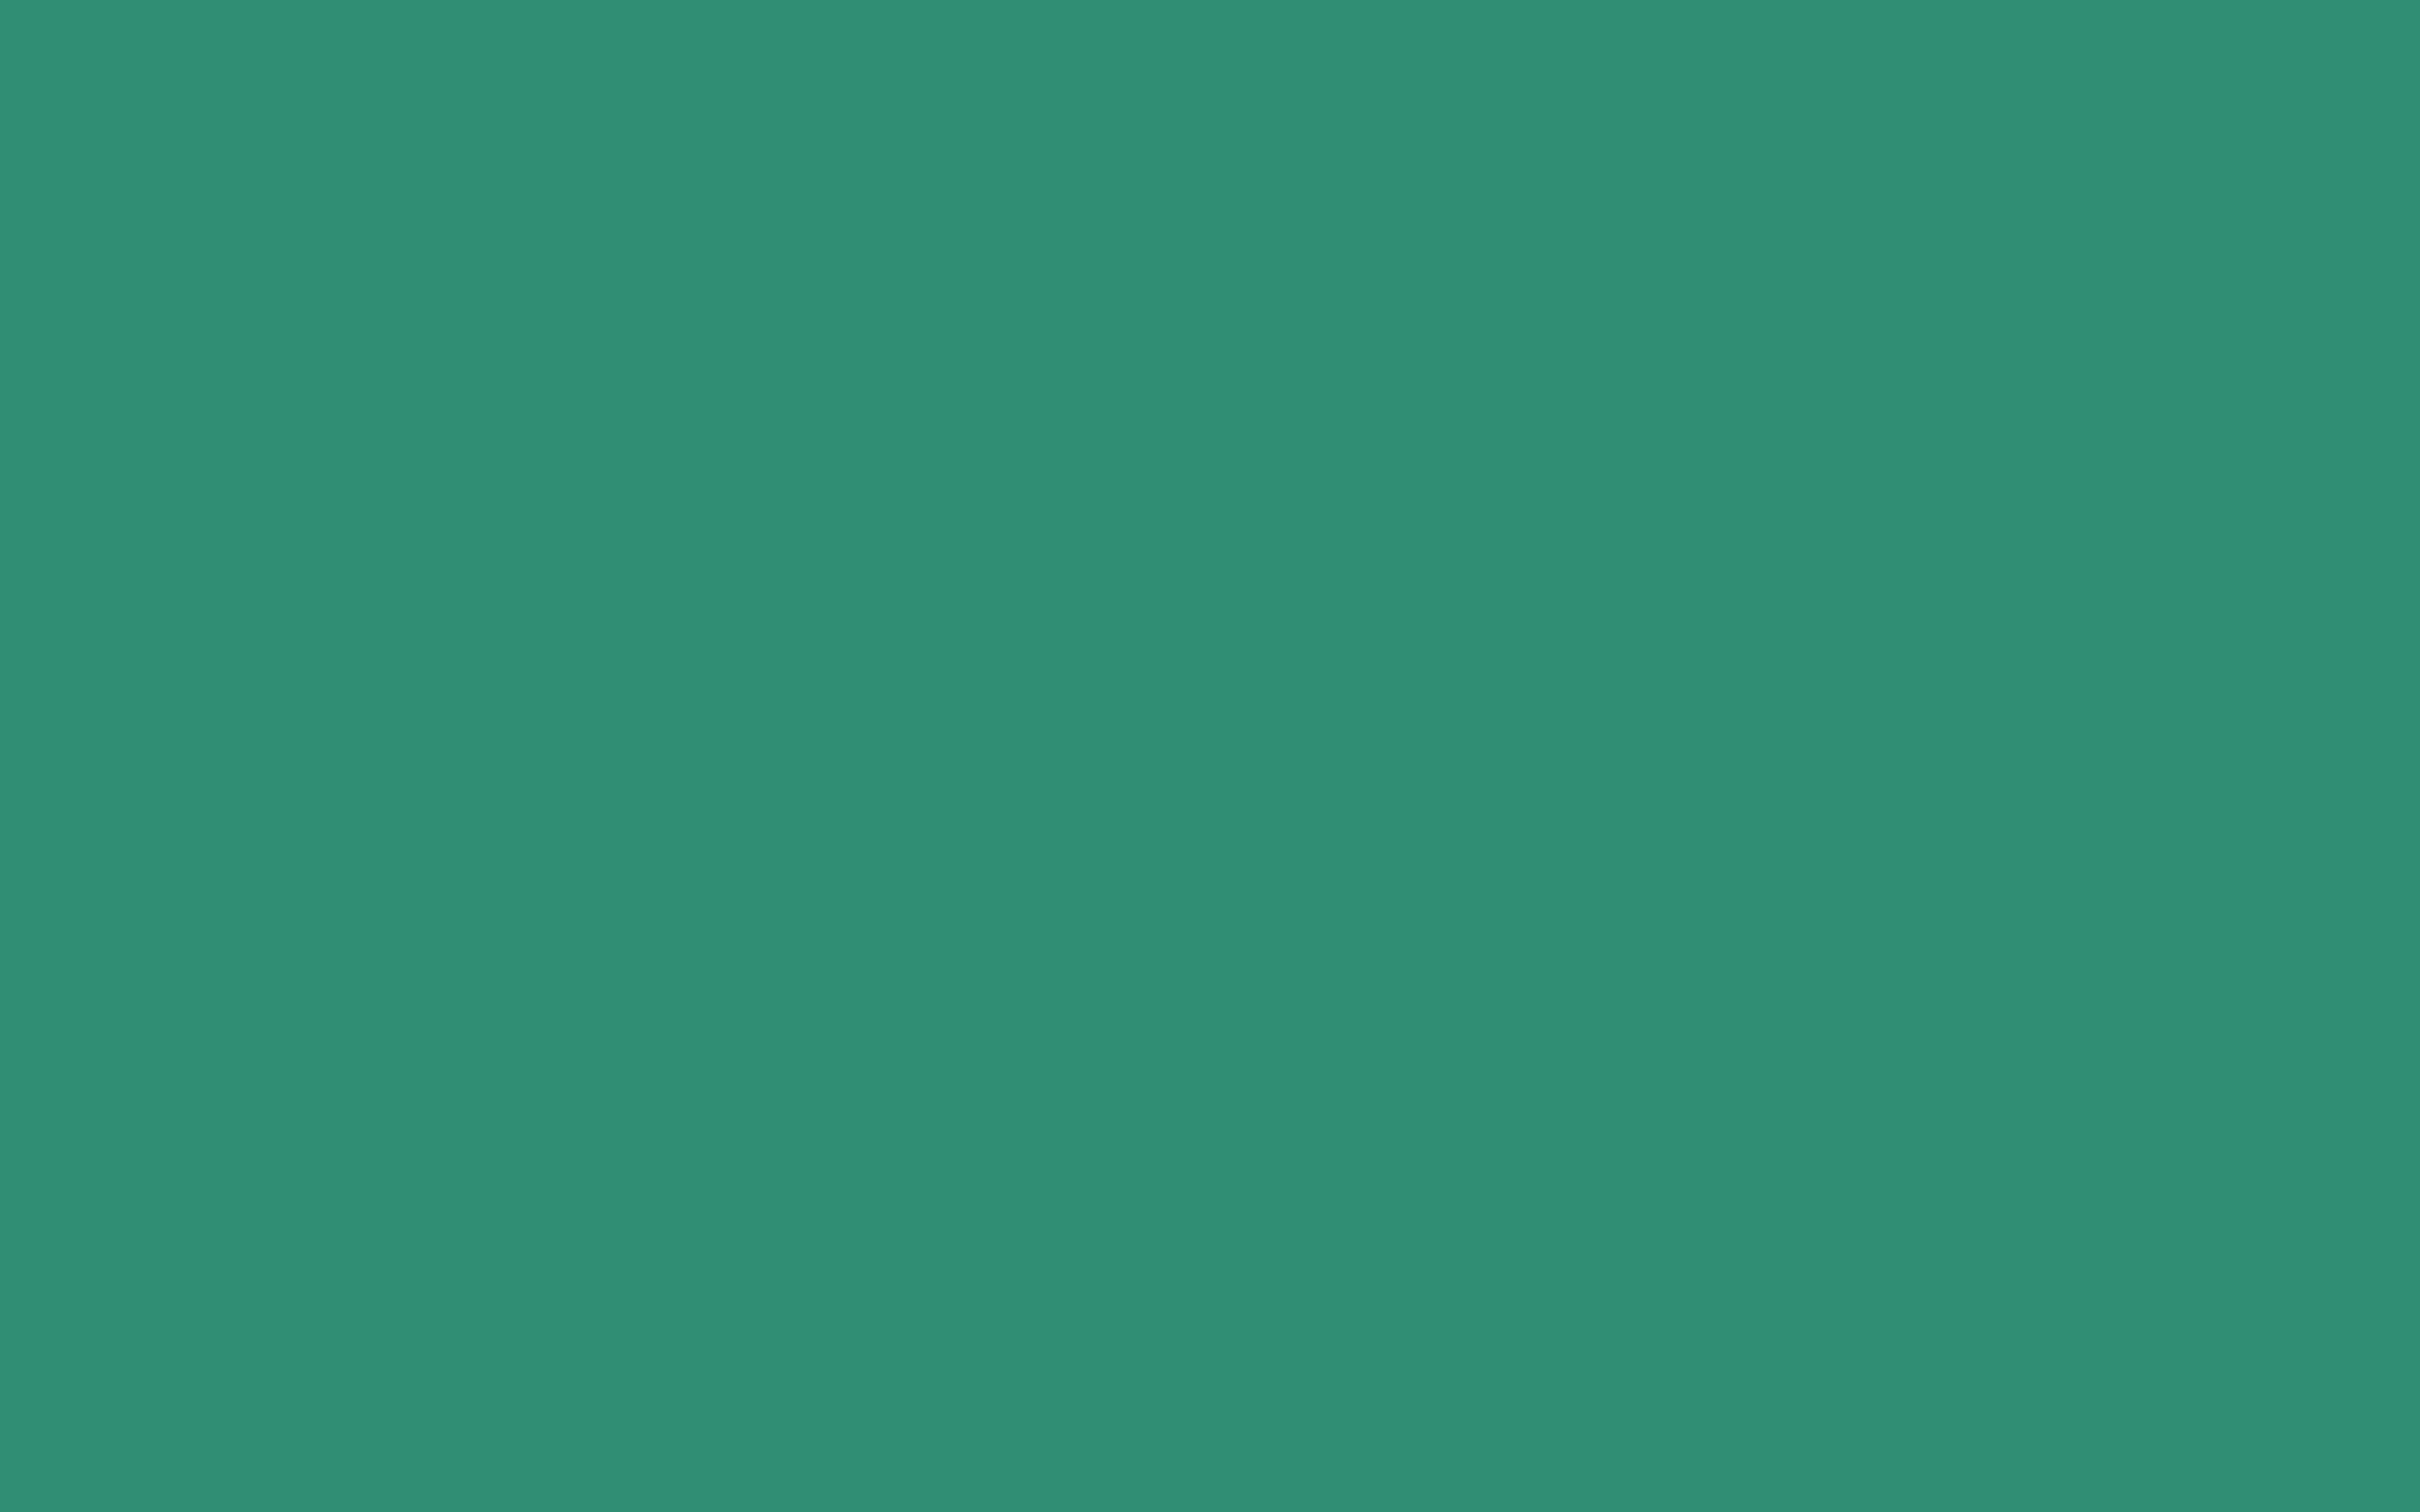 2560x1600 Illuminating Emerald Solid Color Background 2560x1600